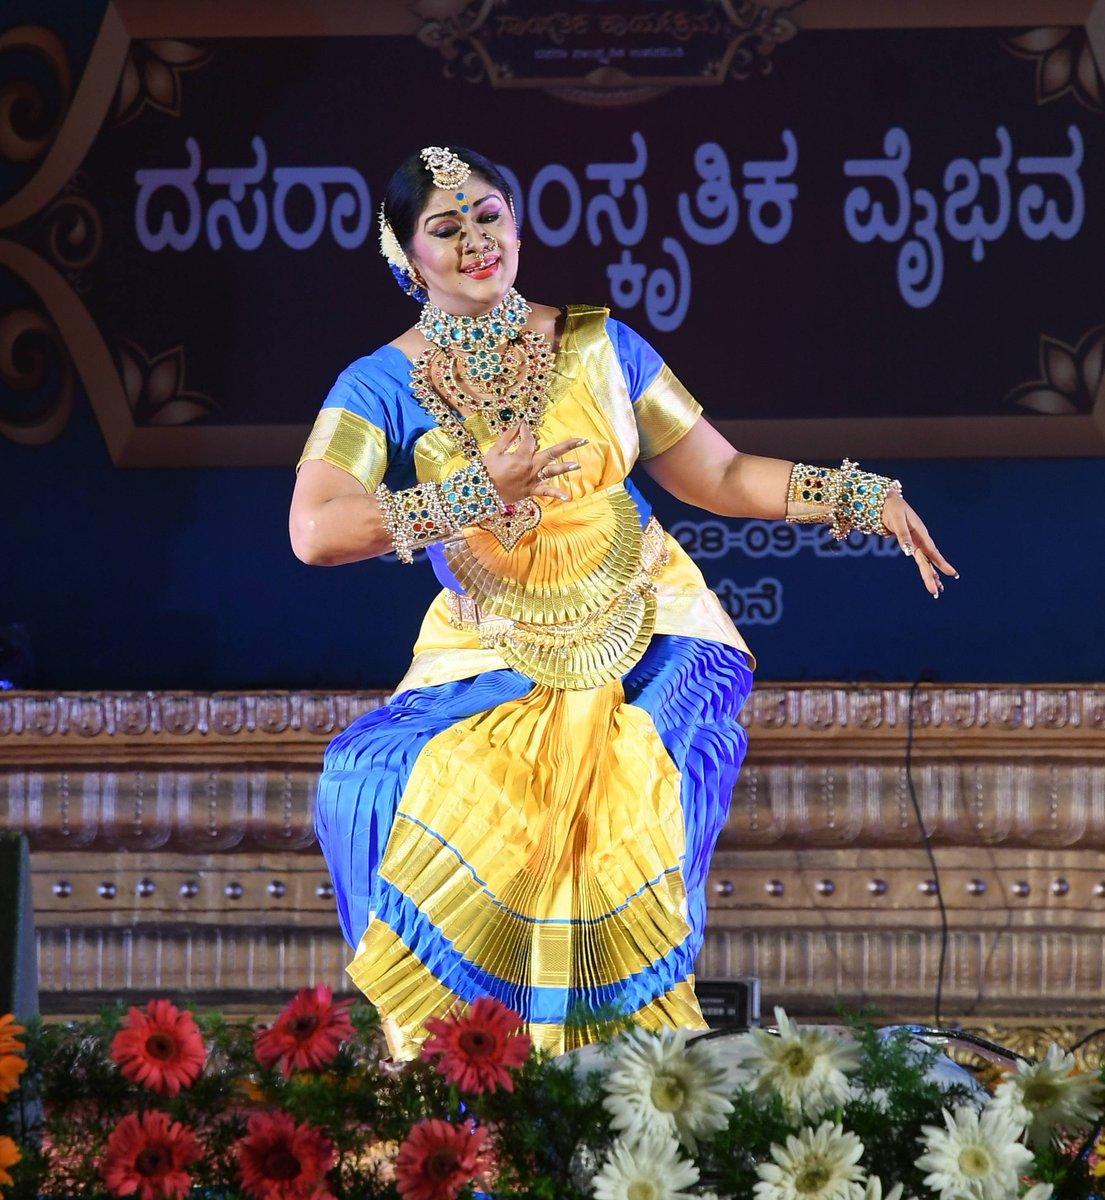 Sudha Chandran Sudha Chandran new photo